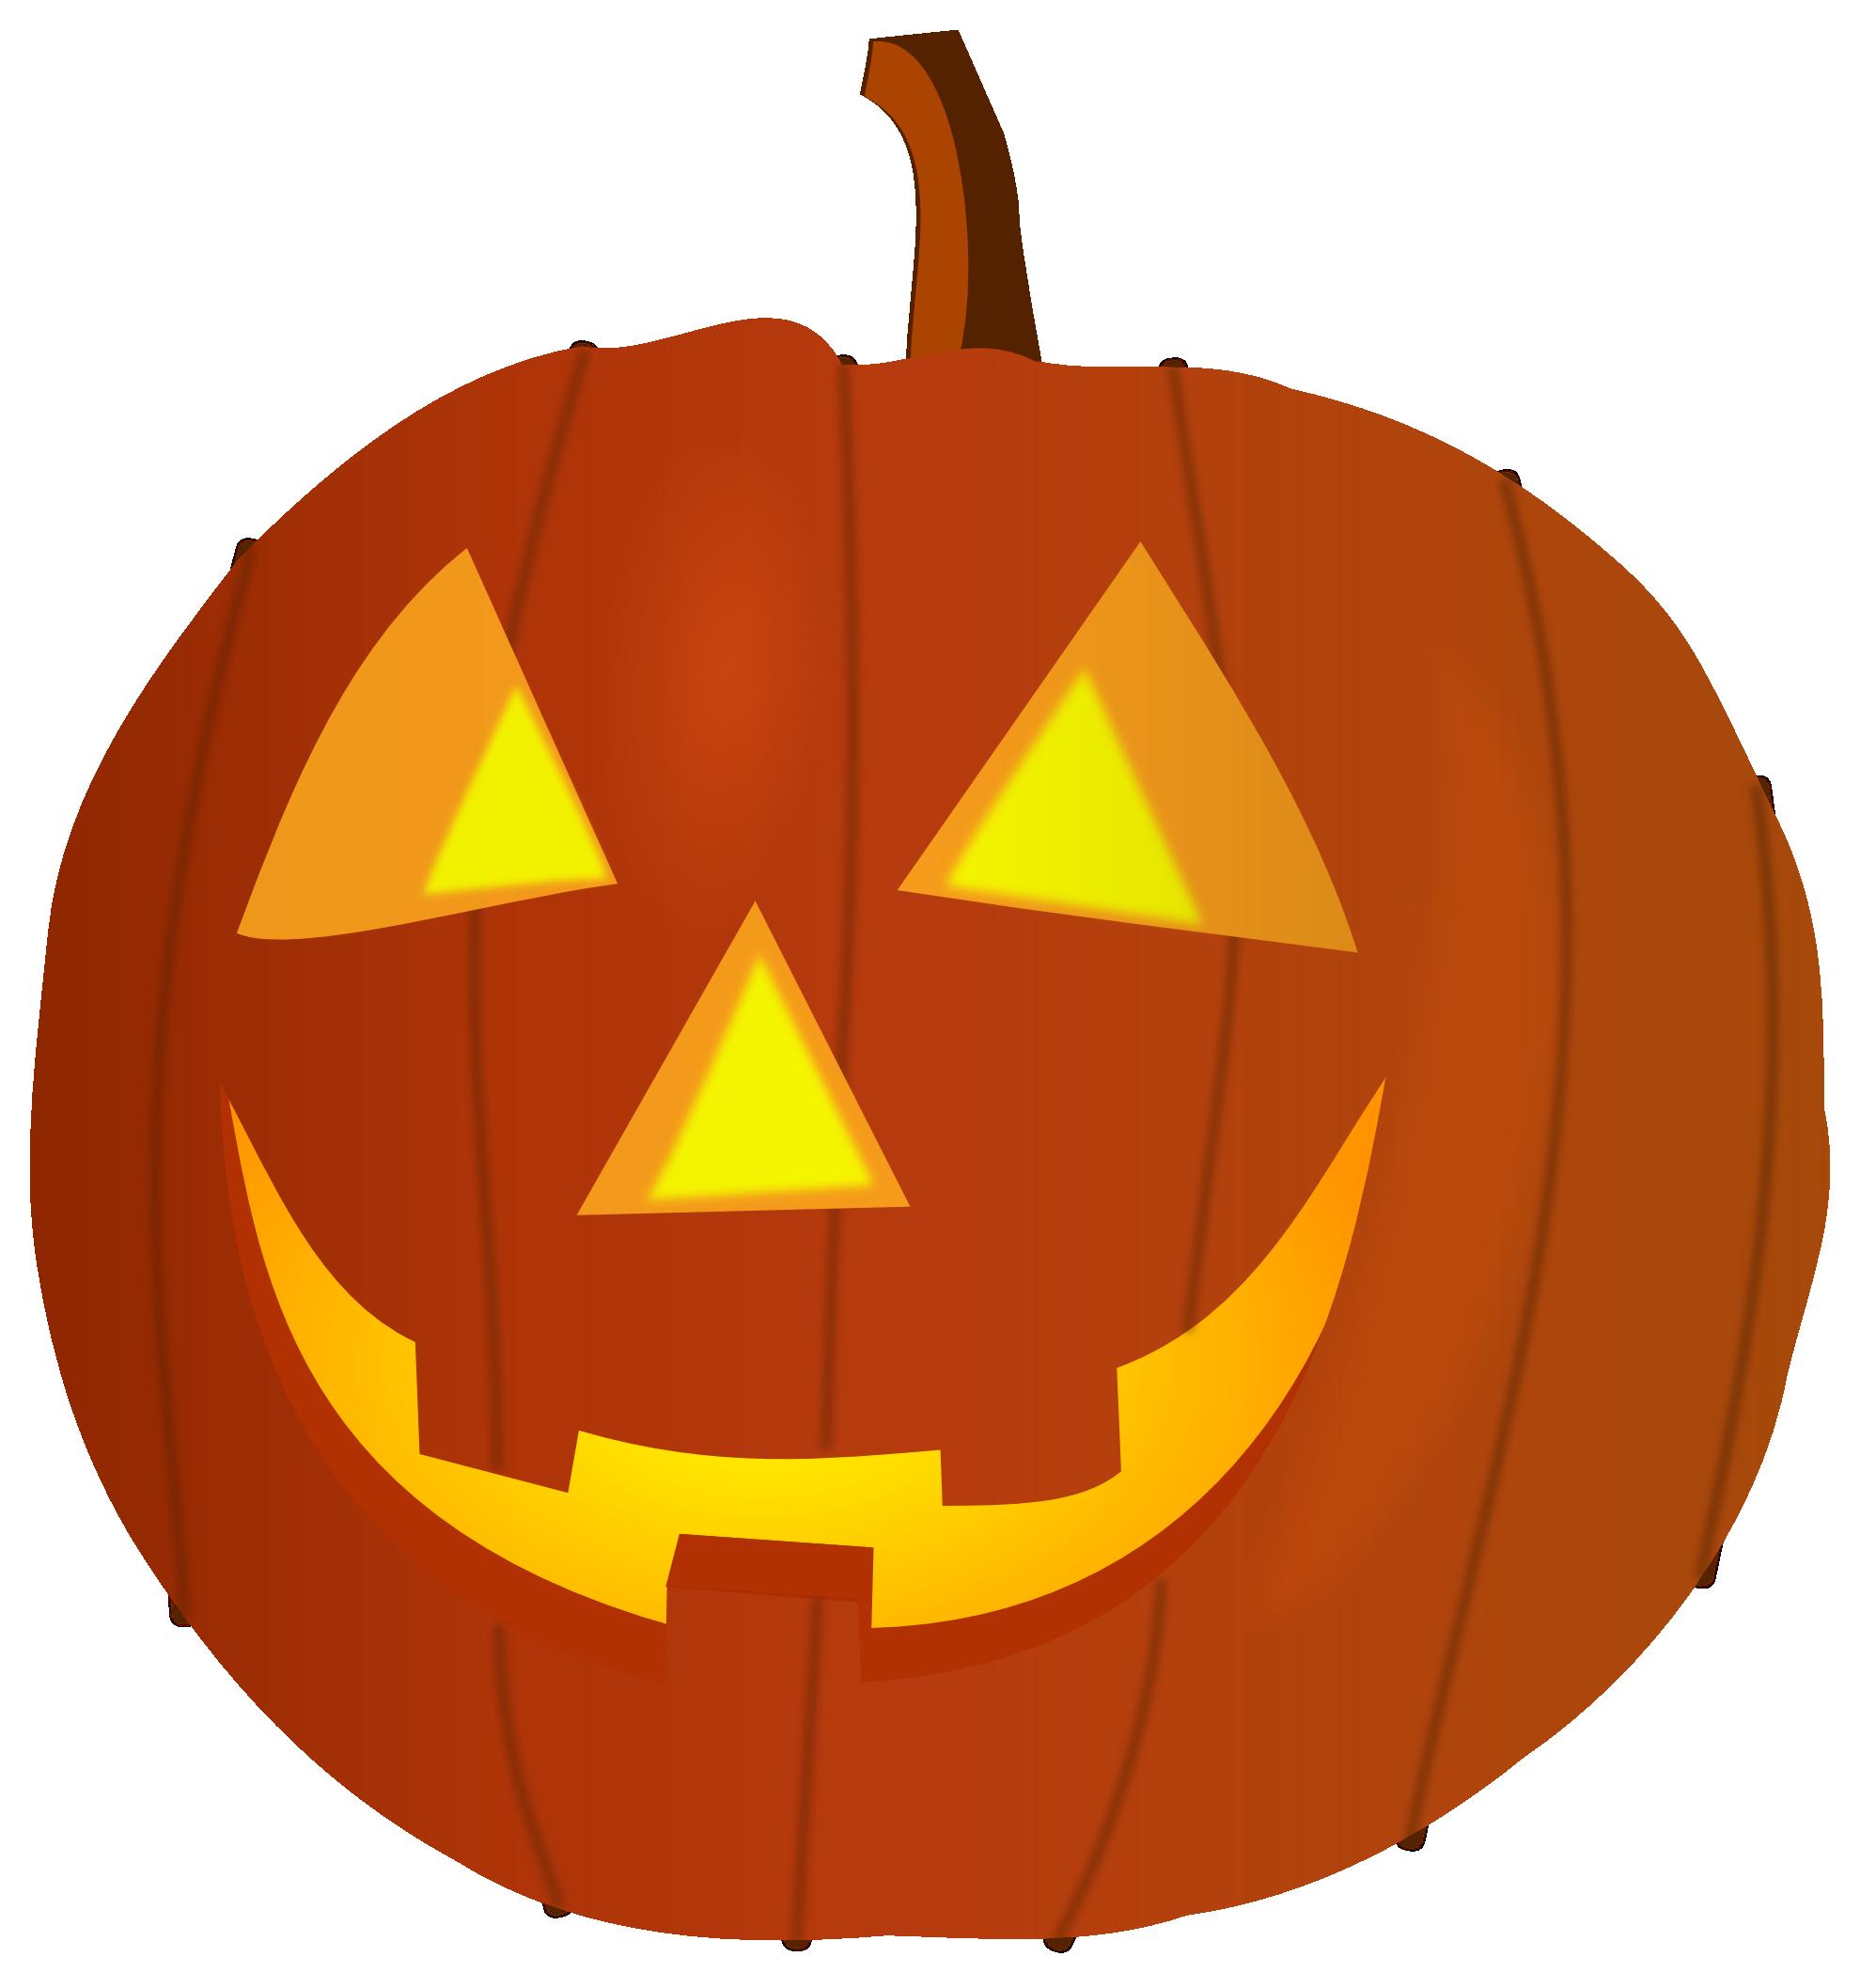 Happy halloween pumpkin clipart free images